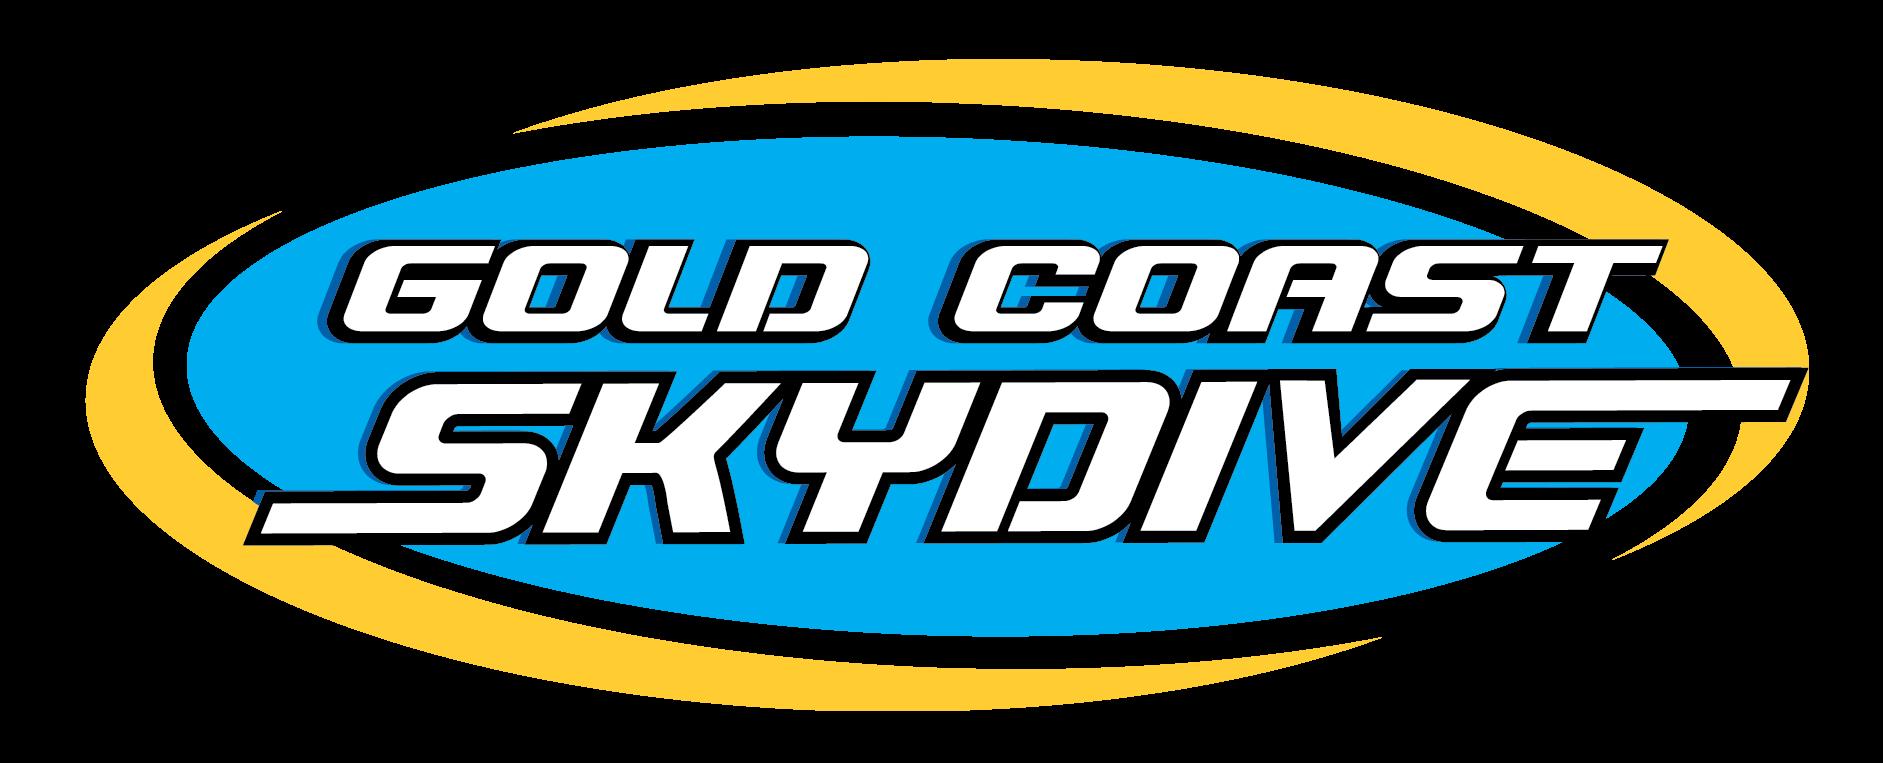 GoldCoastSkydive